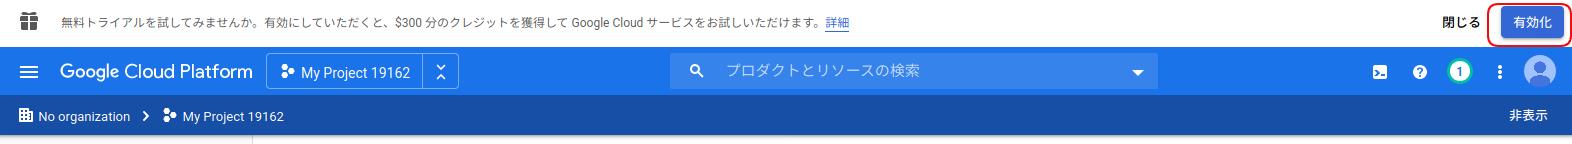 screenshot-console.cloud.google.com-2020.05.29-00_26_39.png